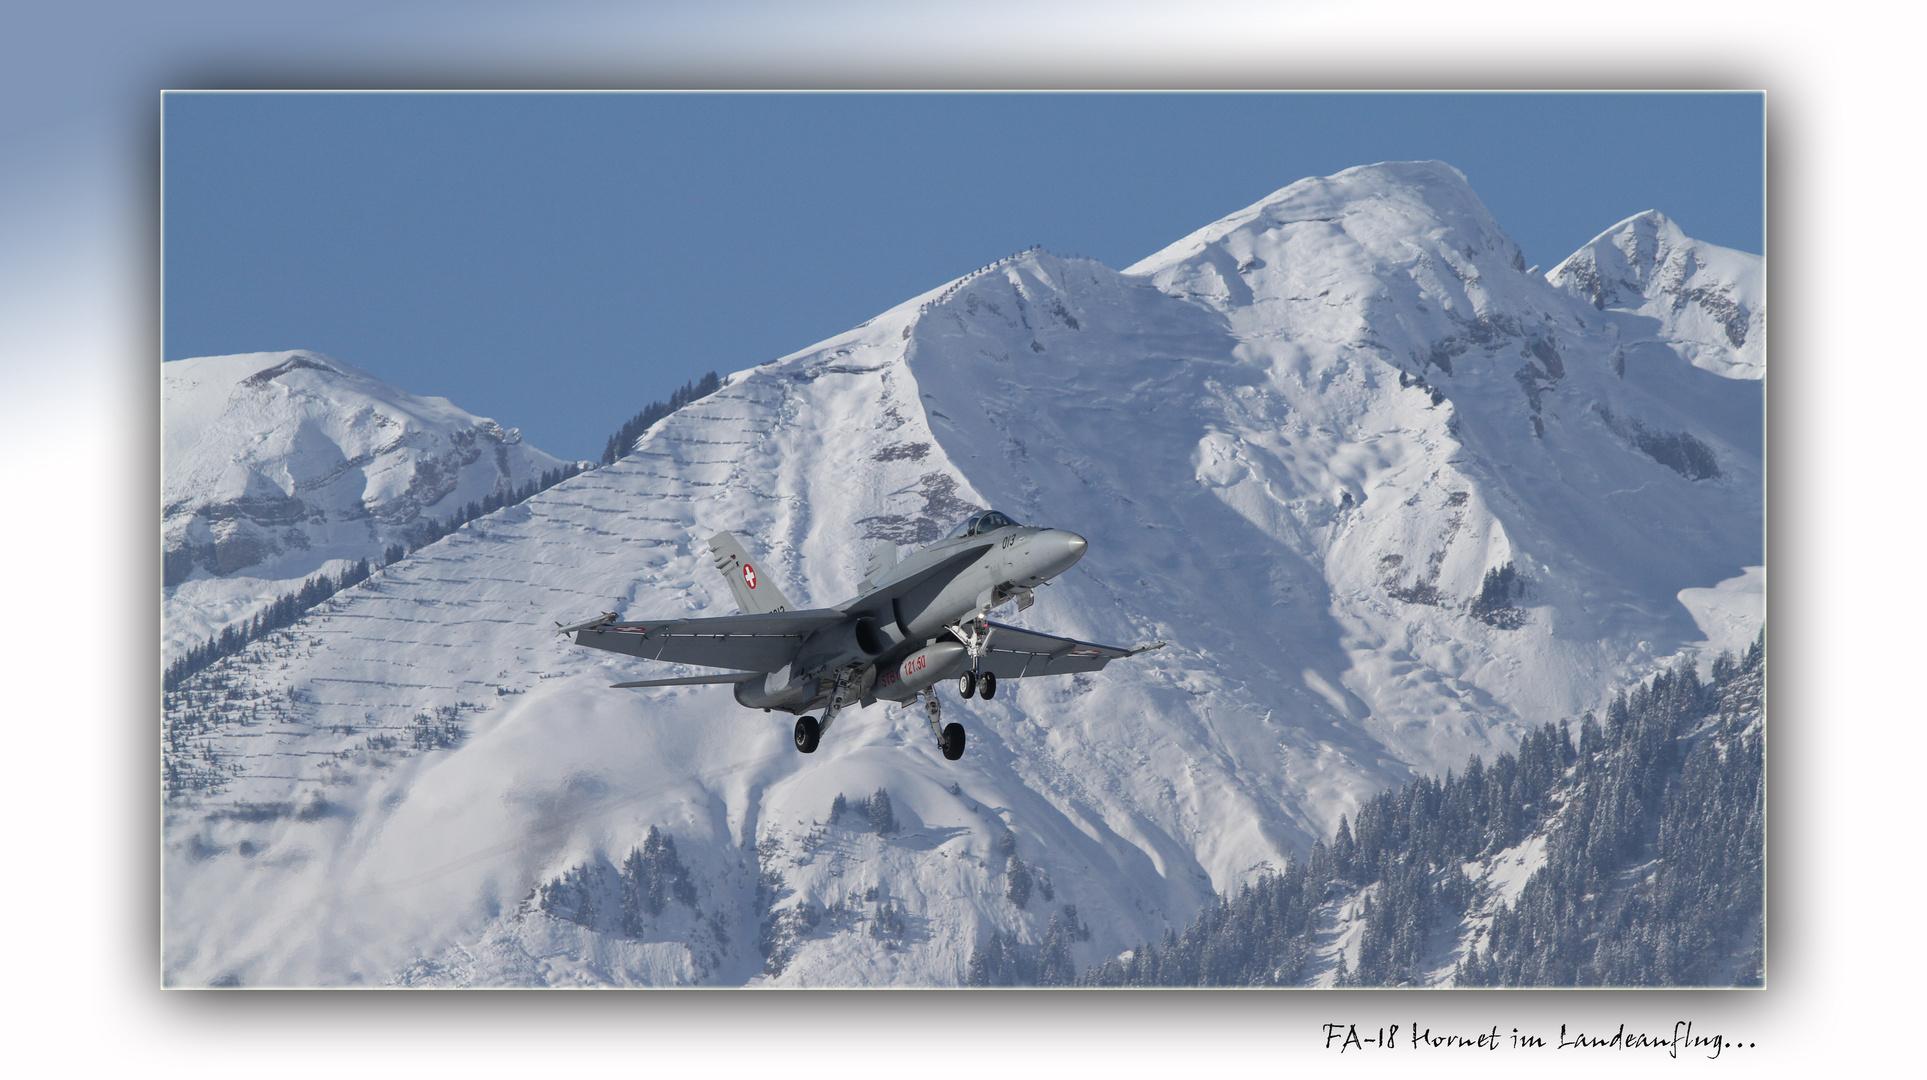 FA-18 Hornet im Landeanflug...